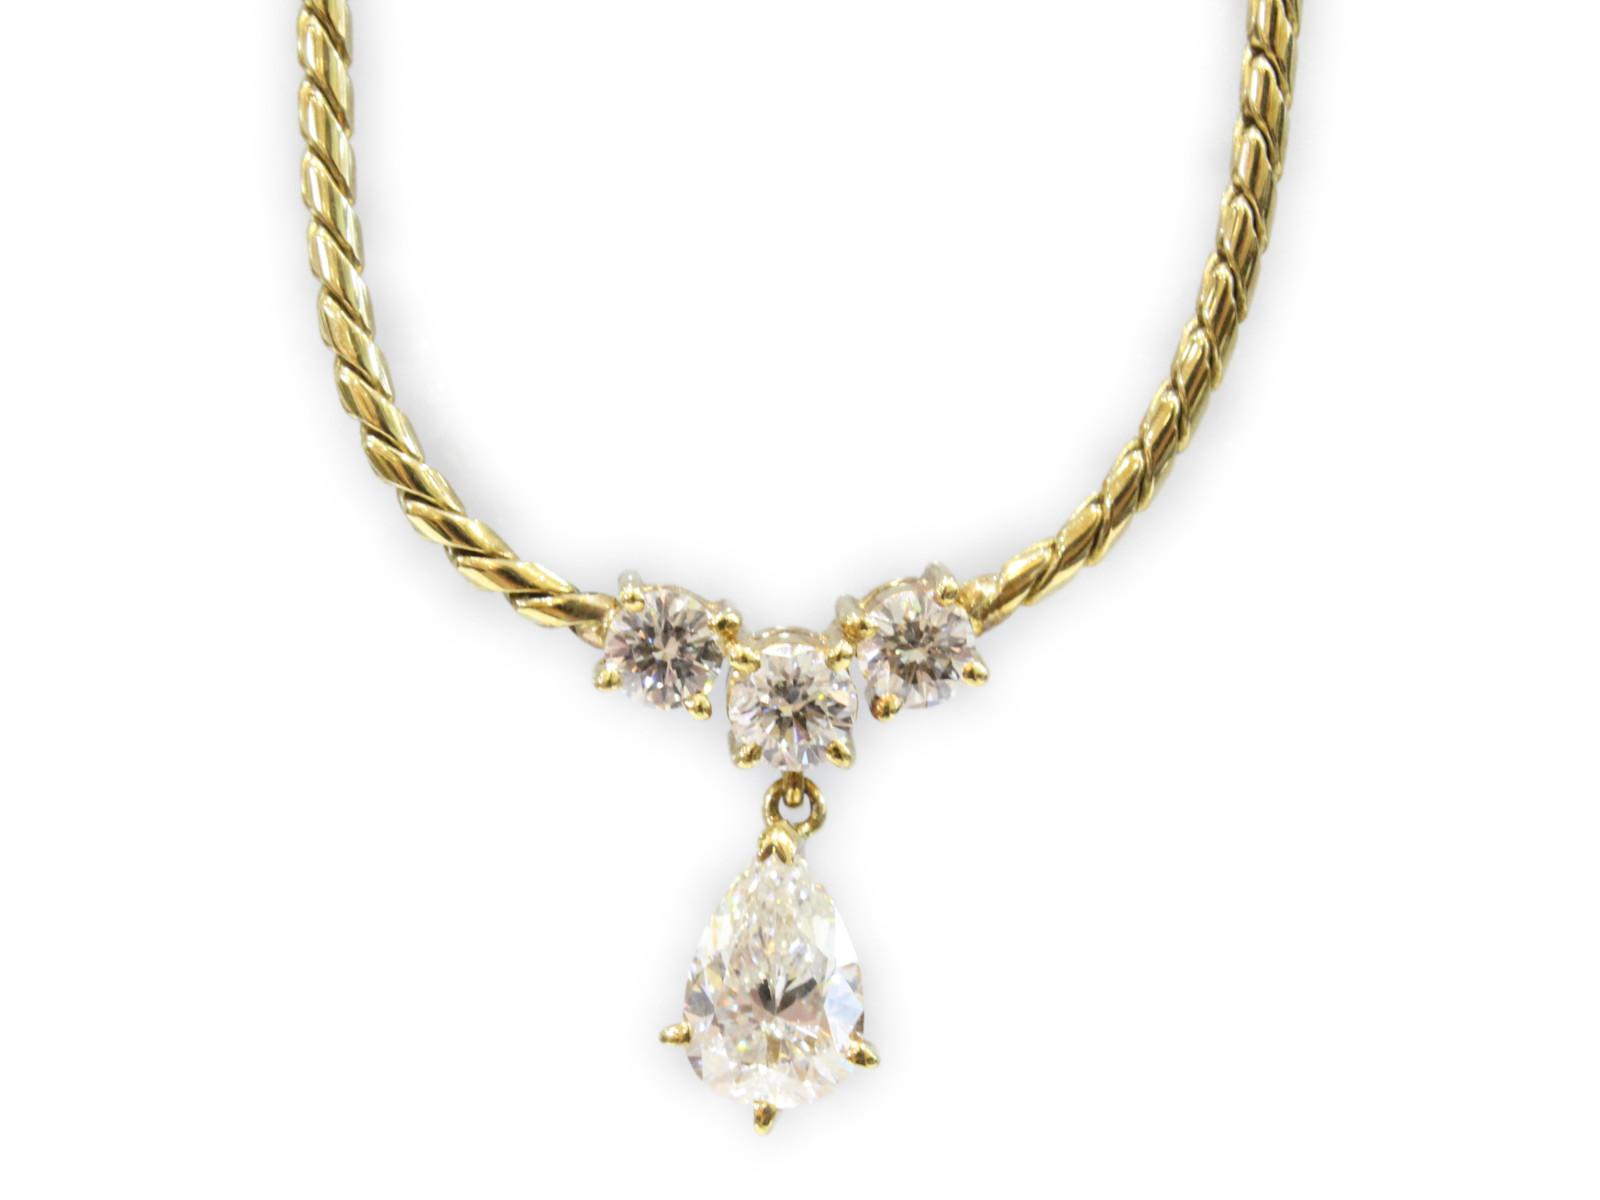 K18 ネックレスダイヤモンド1 01ct 脇ダイヤ2P0 57ctF1TclKJ